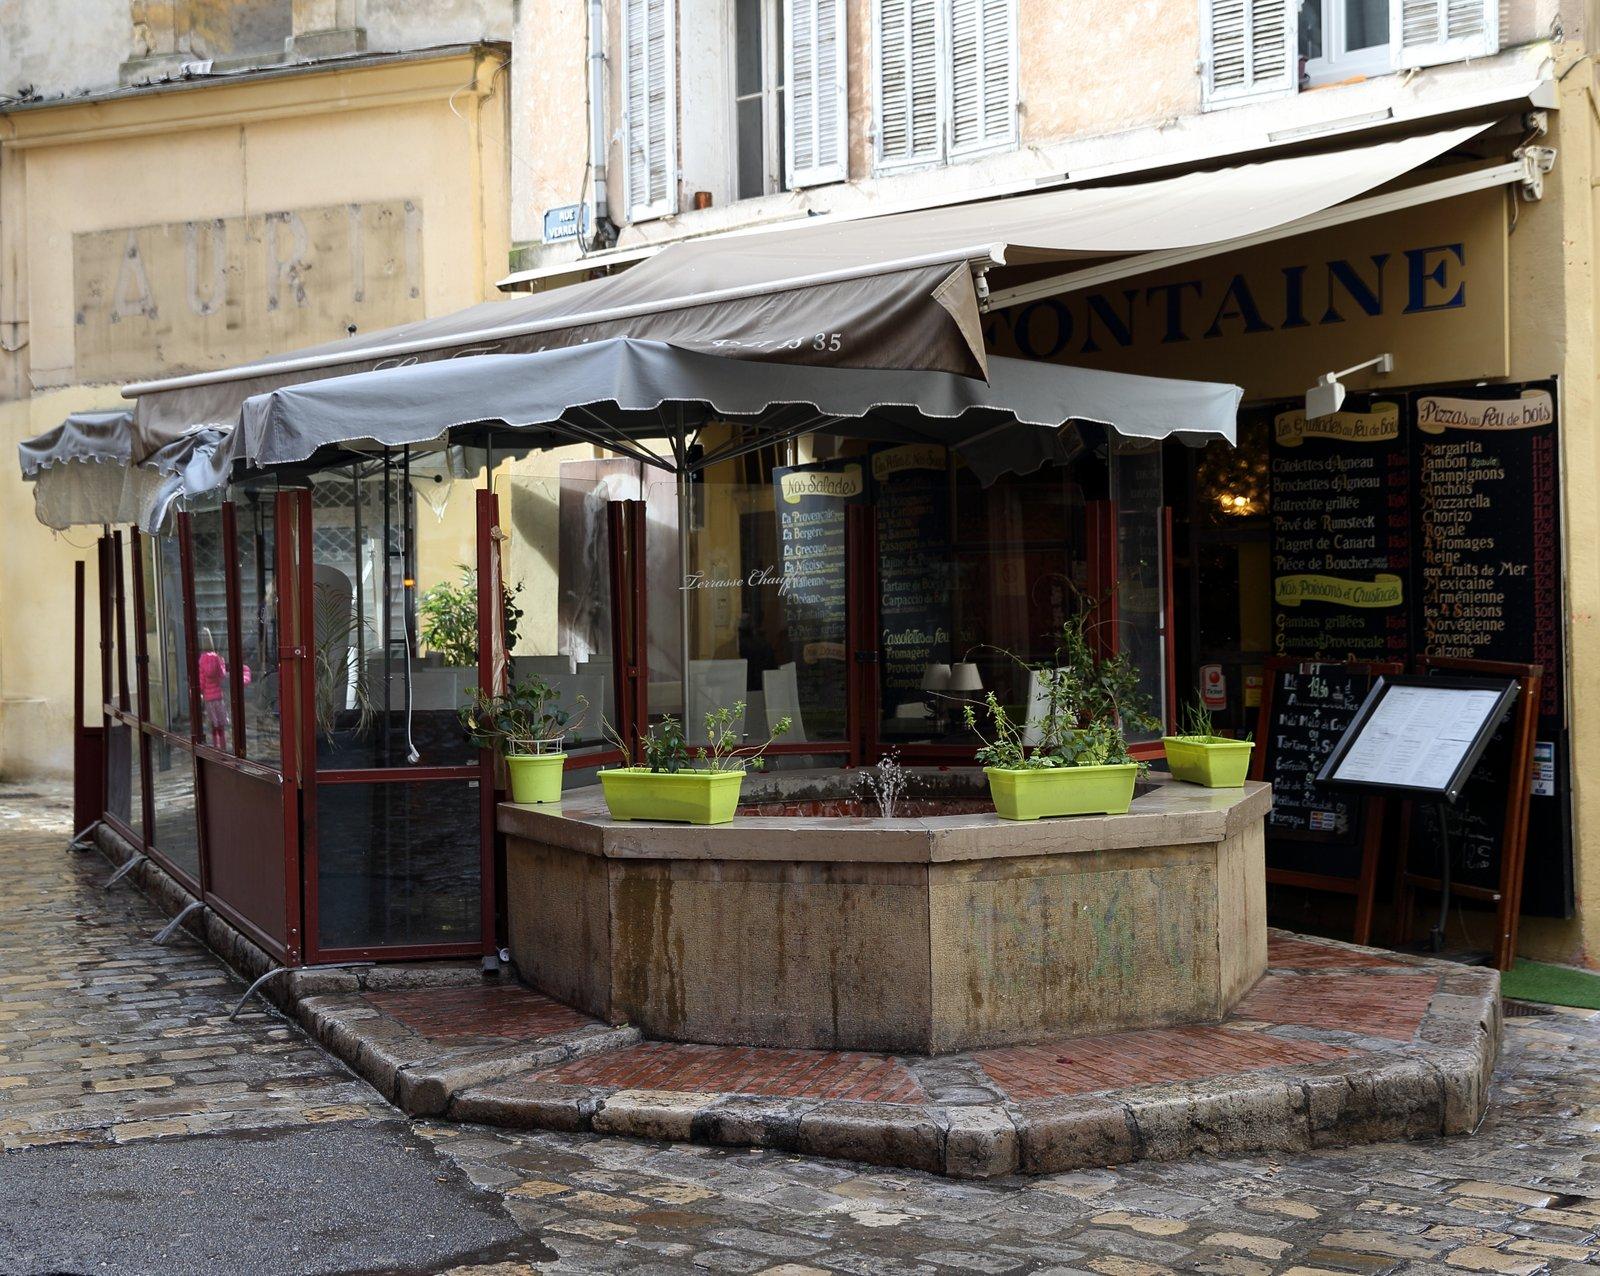 Fontaine rue de la Verrerie